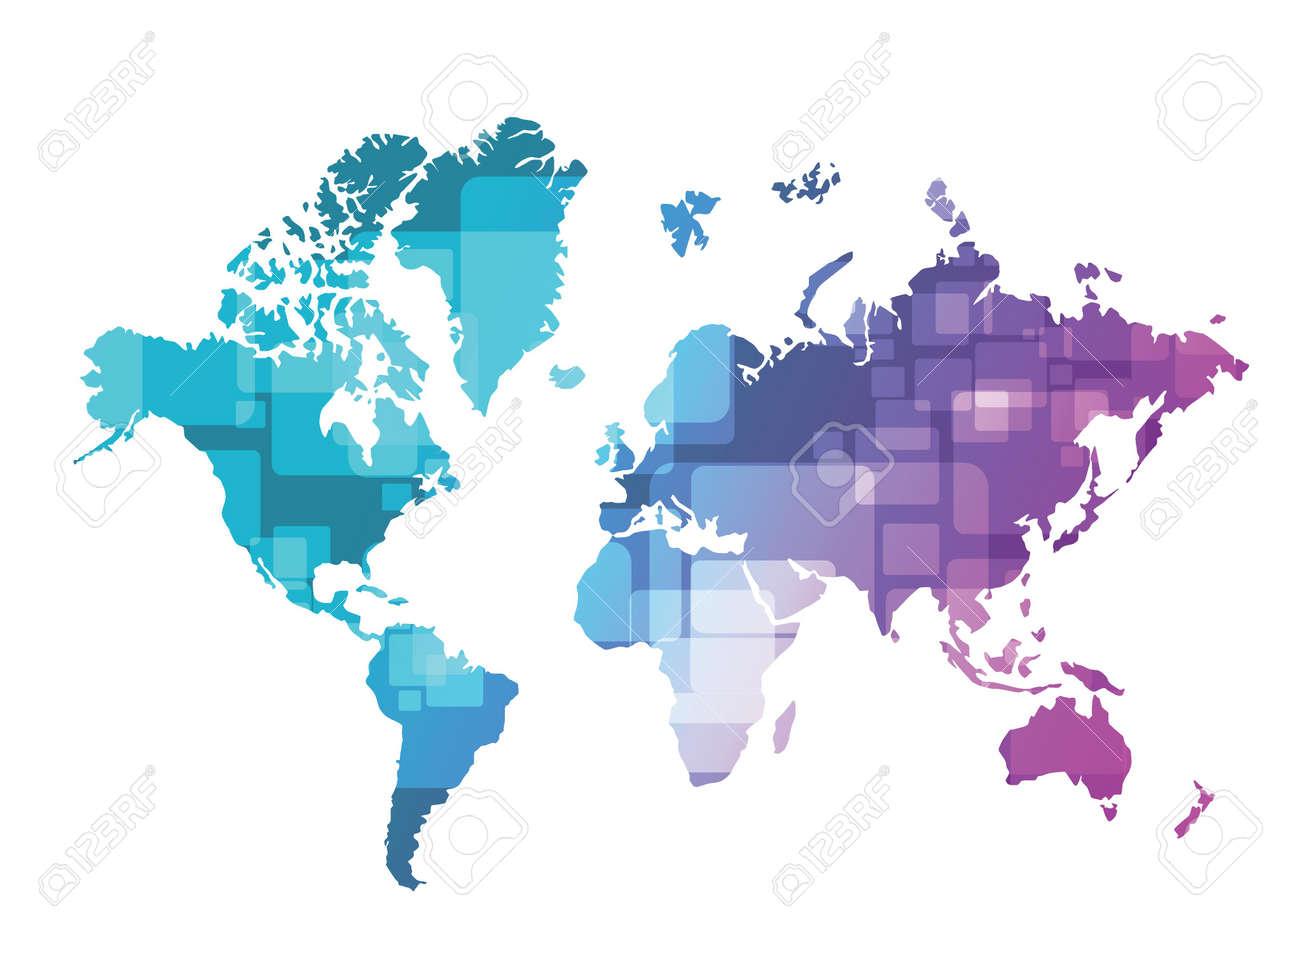 World map graphic design idealstalist world map graphic design gumiabroncs Images